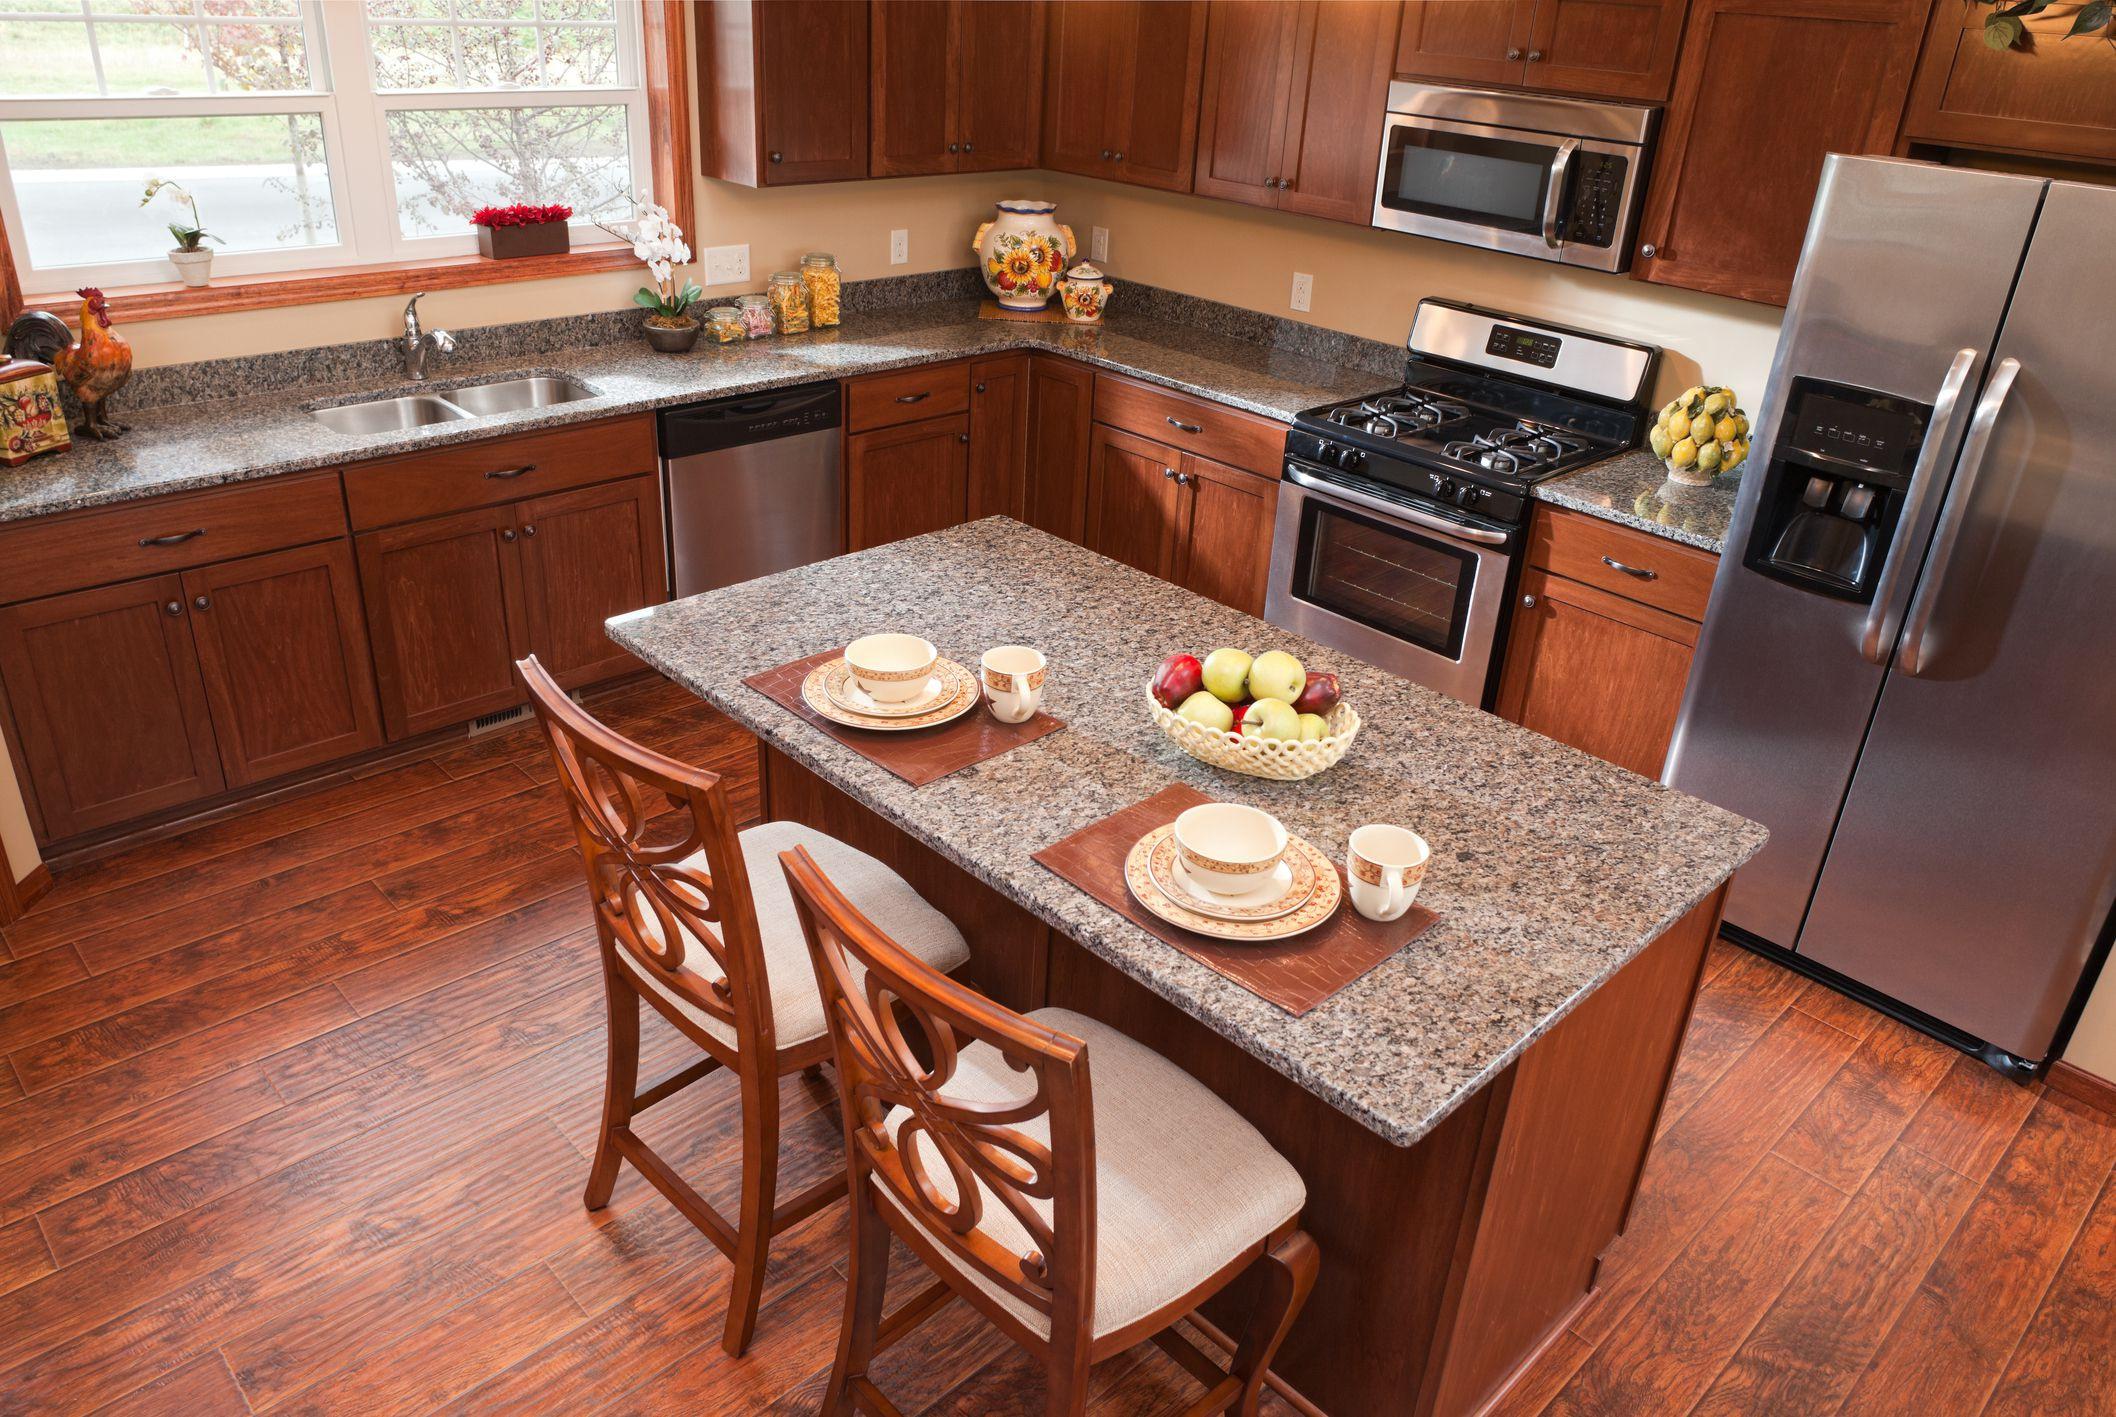 Aquabar B Hardwood Flooring Underlayment Problems Of Can You Install Laminate Flooring In the Kitchen Pertaining to Kitchen Laminate Floor Gettyimages 155098316 5895140c5f9b5874ee5f7711